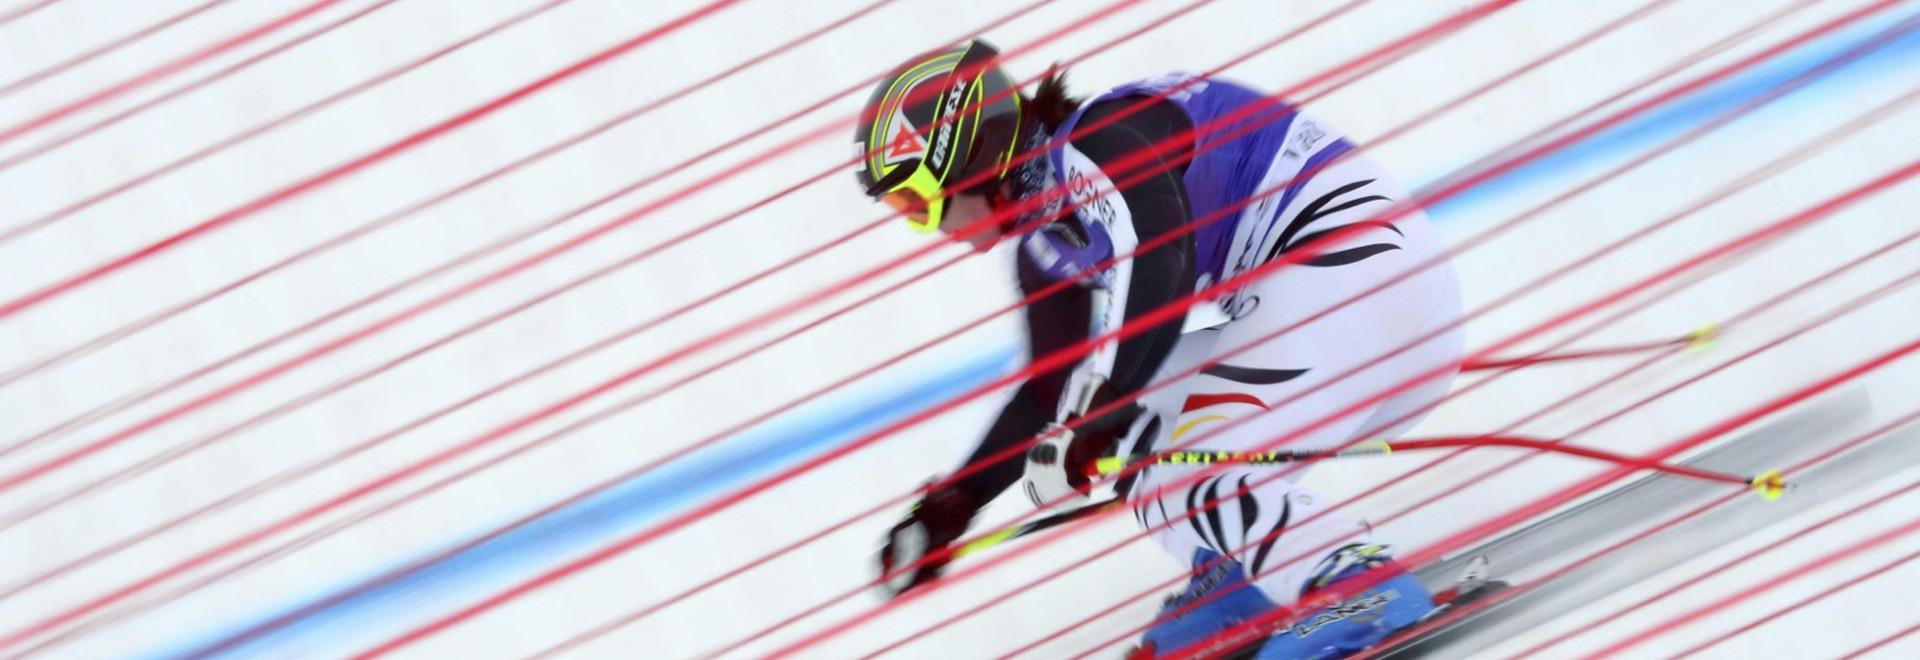 My Olimpic Moment